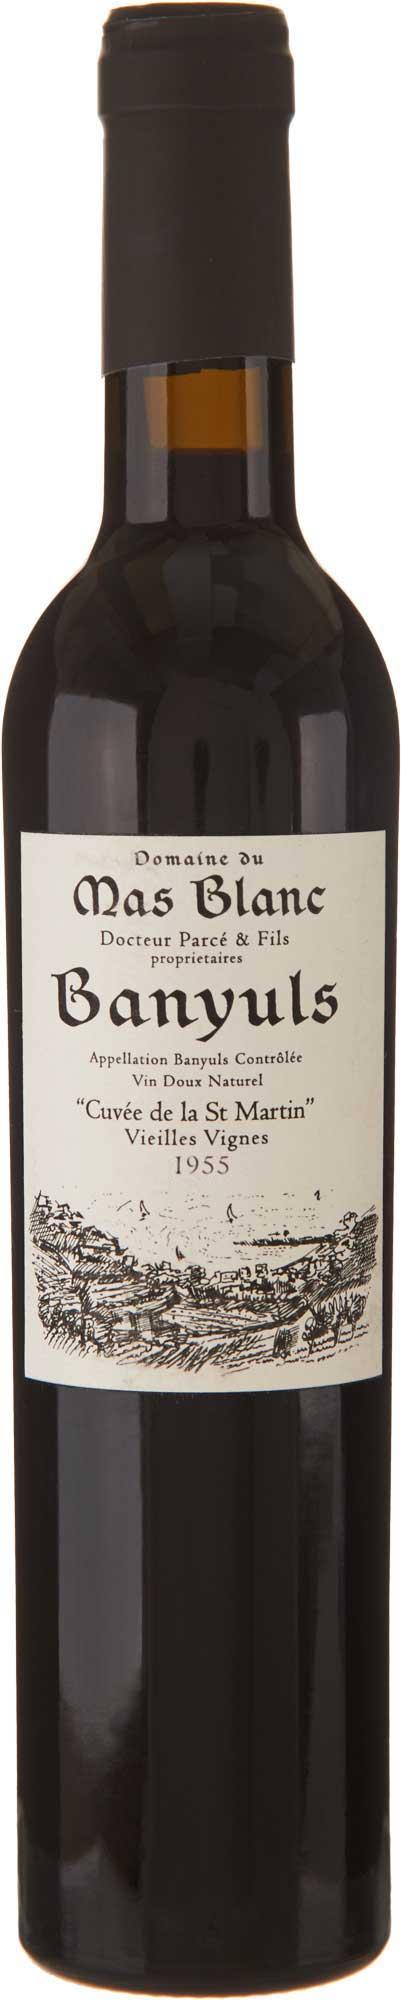 "Domaine du Mas Blanc Banyuls ""Cuvée St. Martin"" 1955"